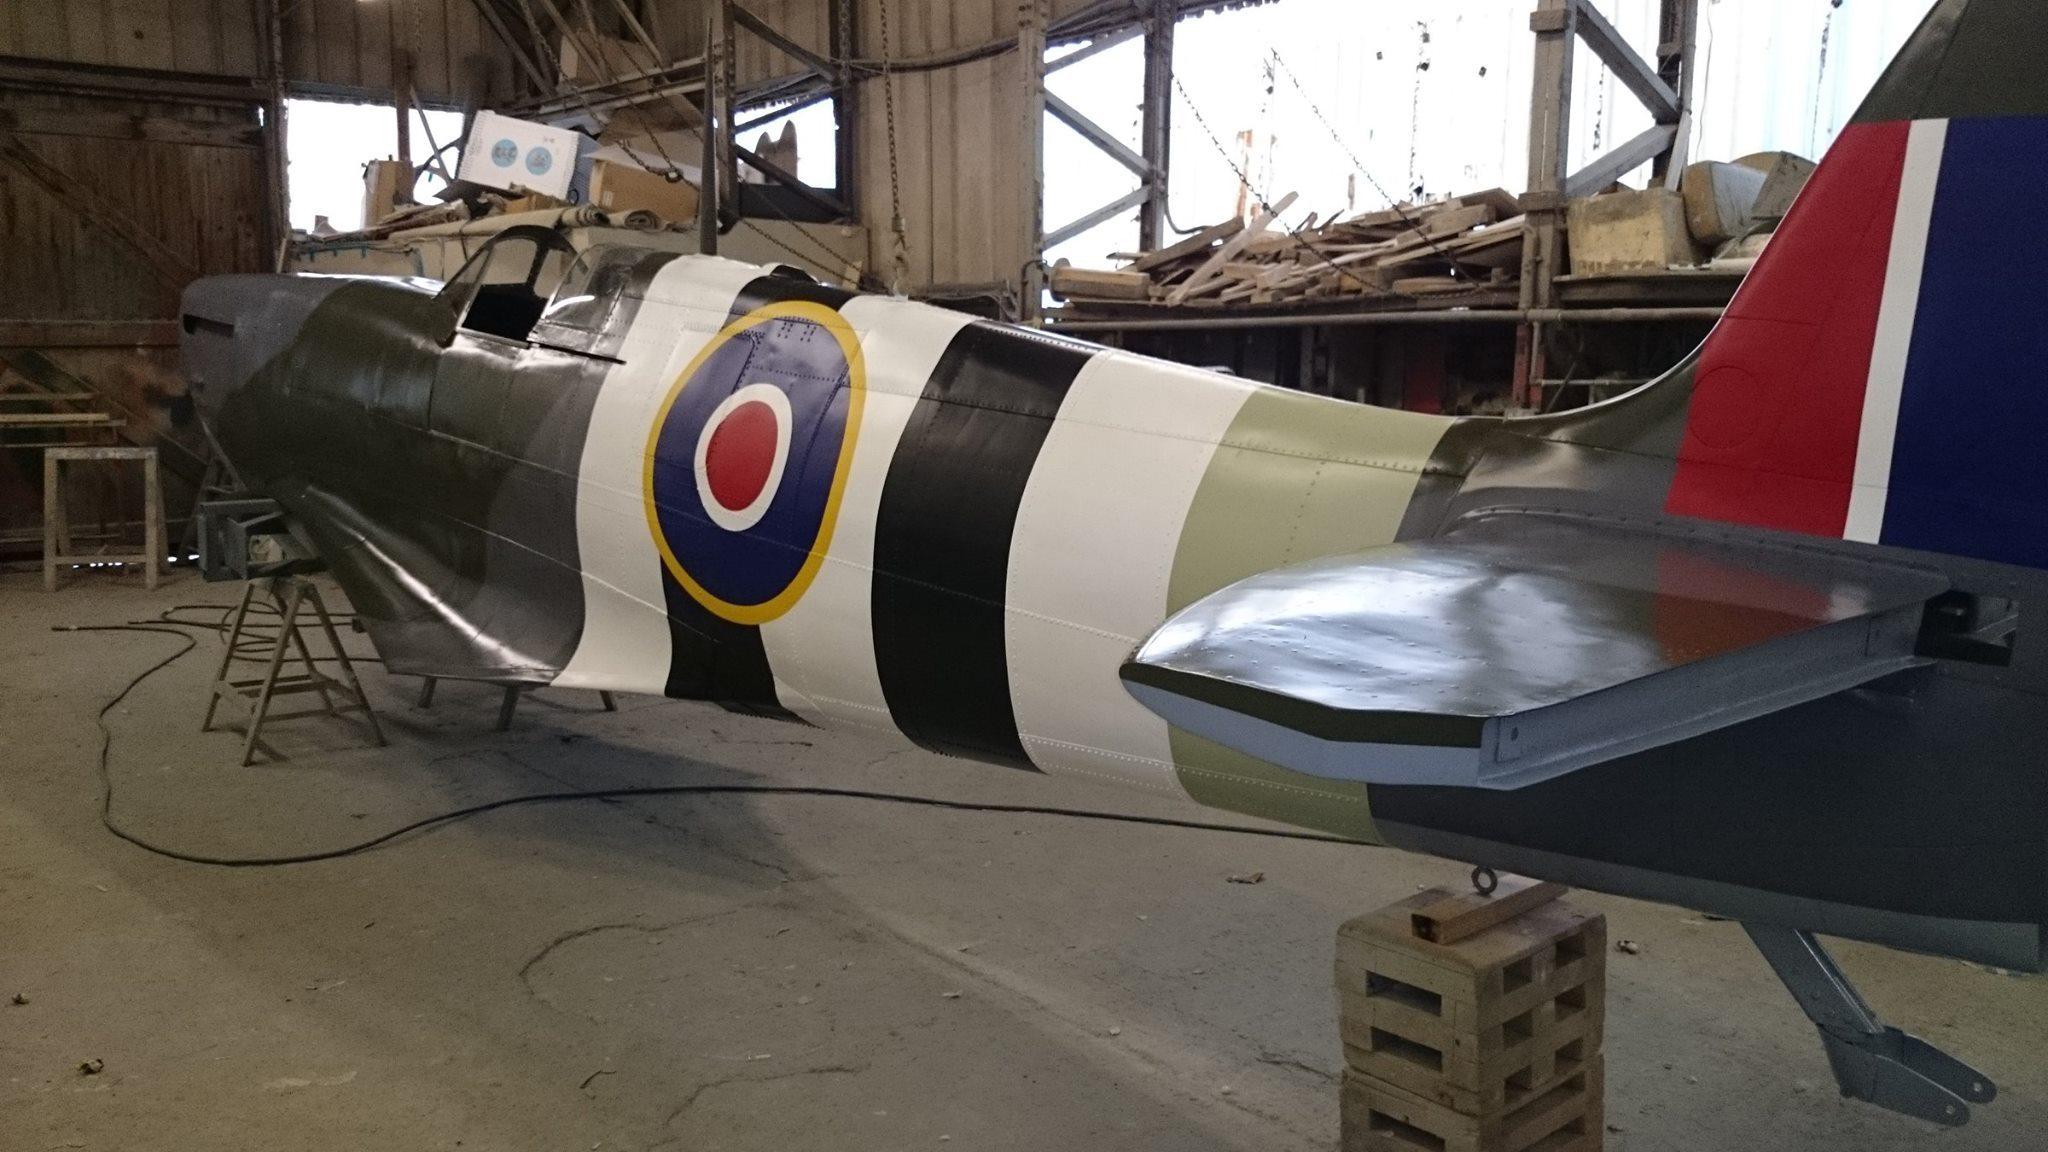 spitfire memorial essex ontario